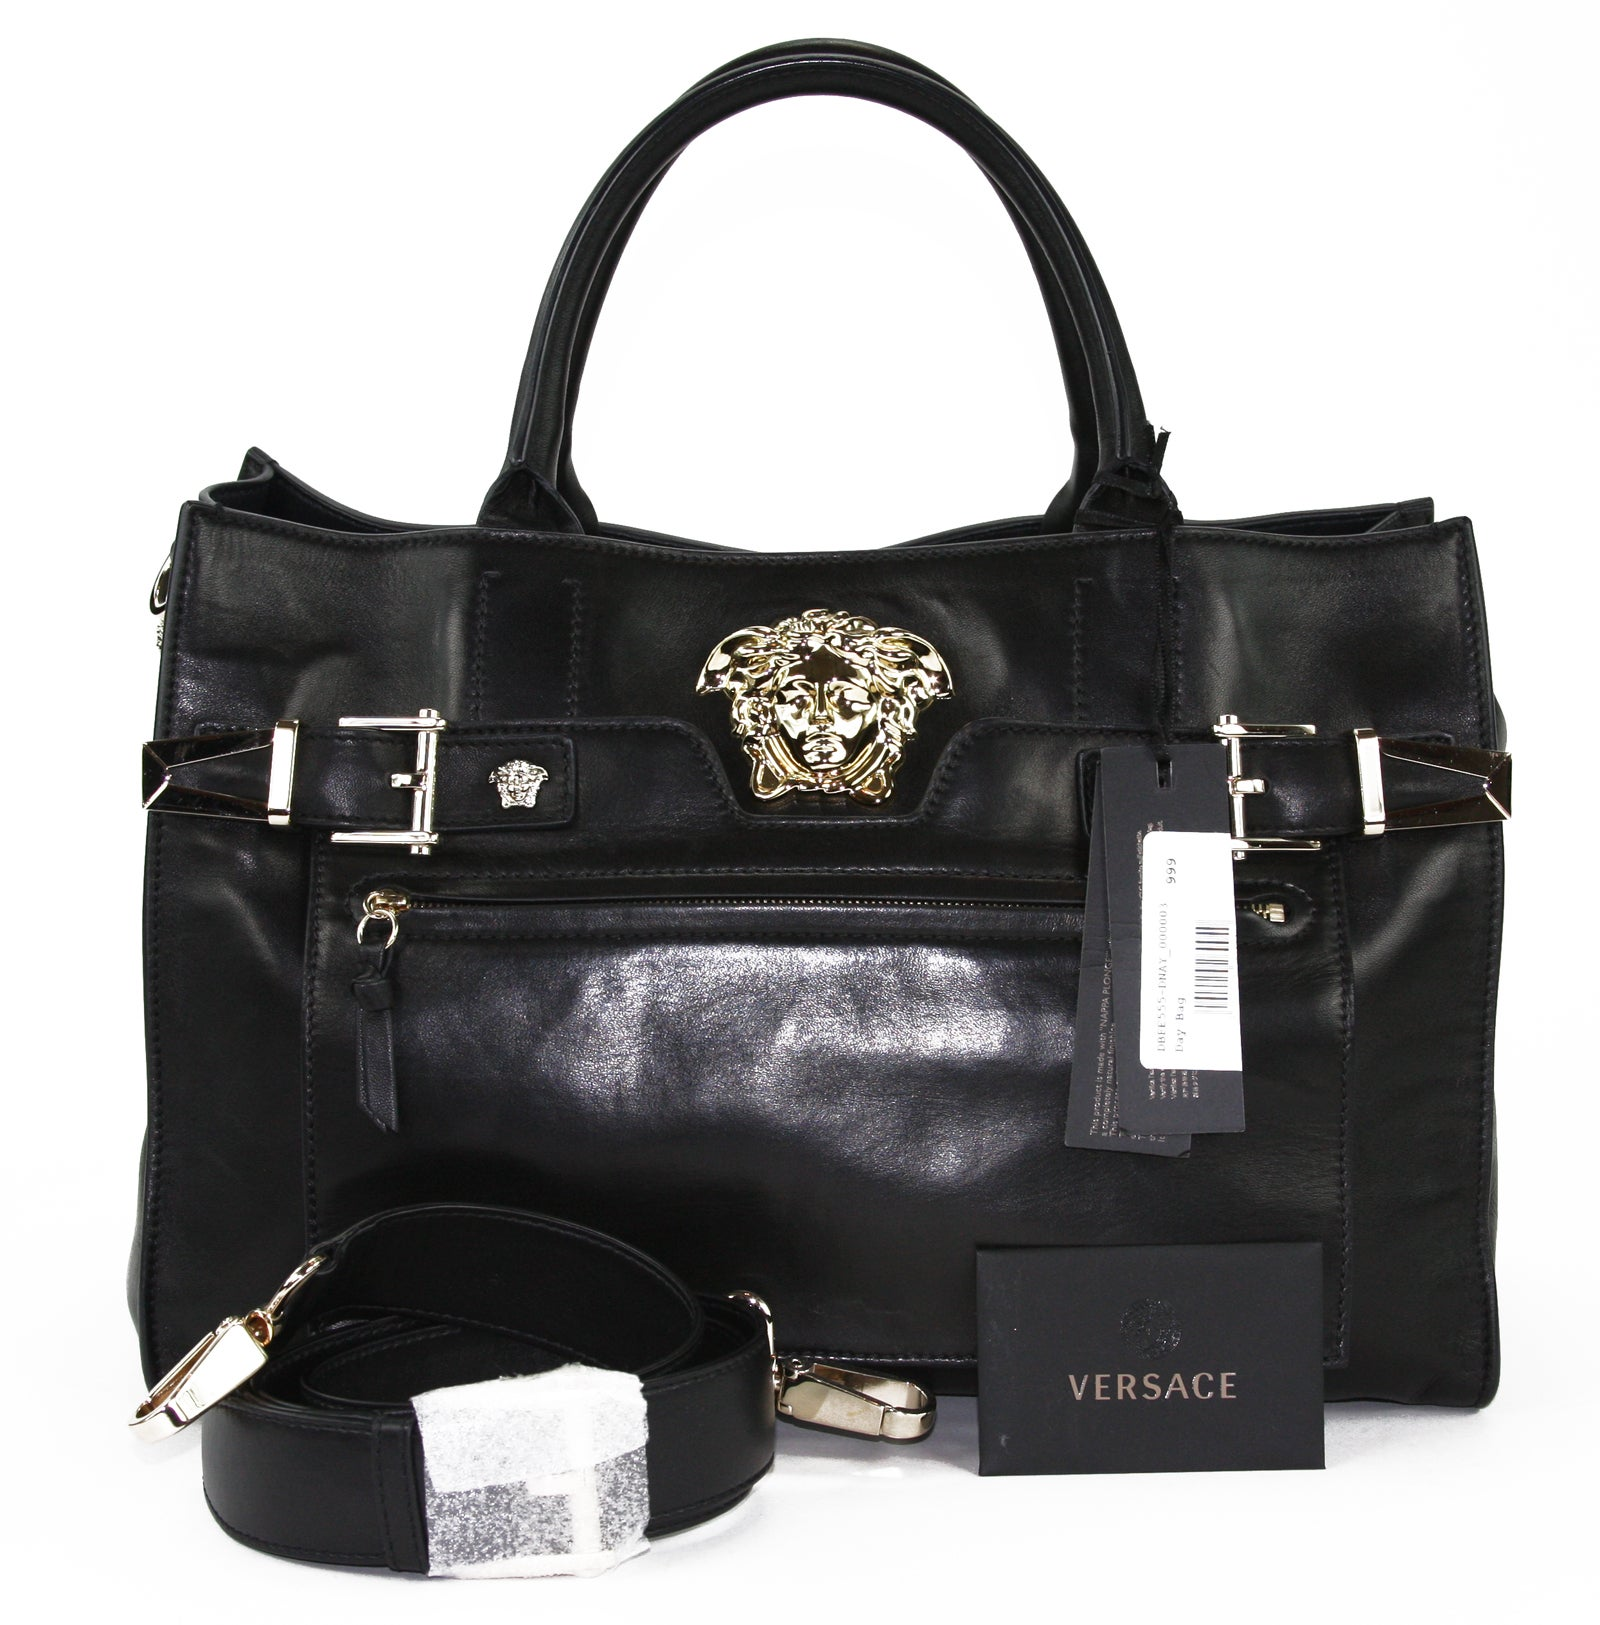 4d05132d94 New Versace Palazzo Large Black Leather Shoulder Bag Handbag at 1stdibs